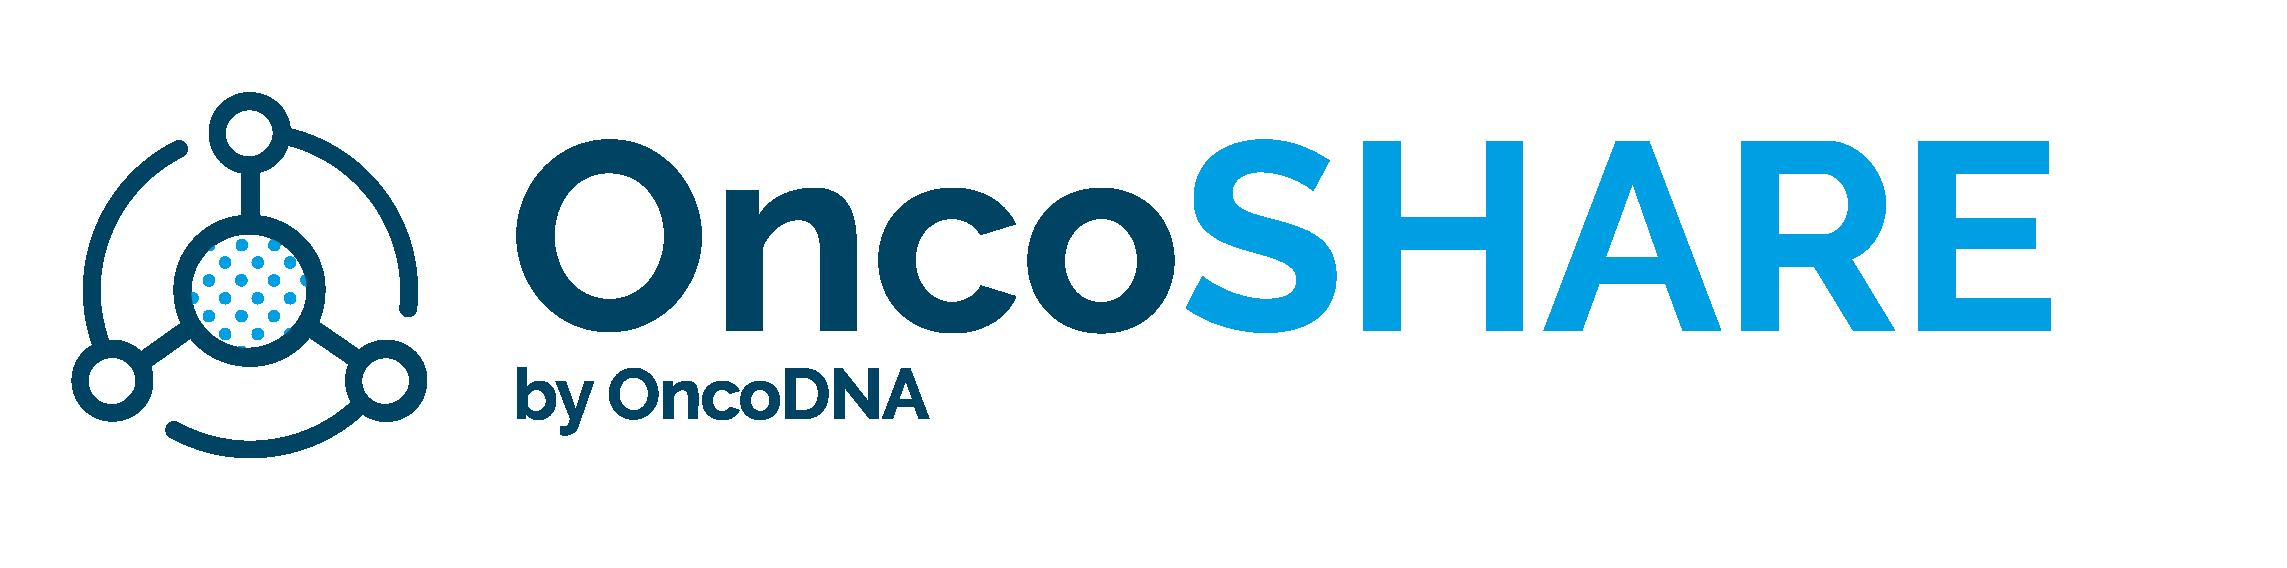 OncoSHARE logo